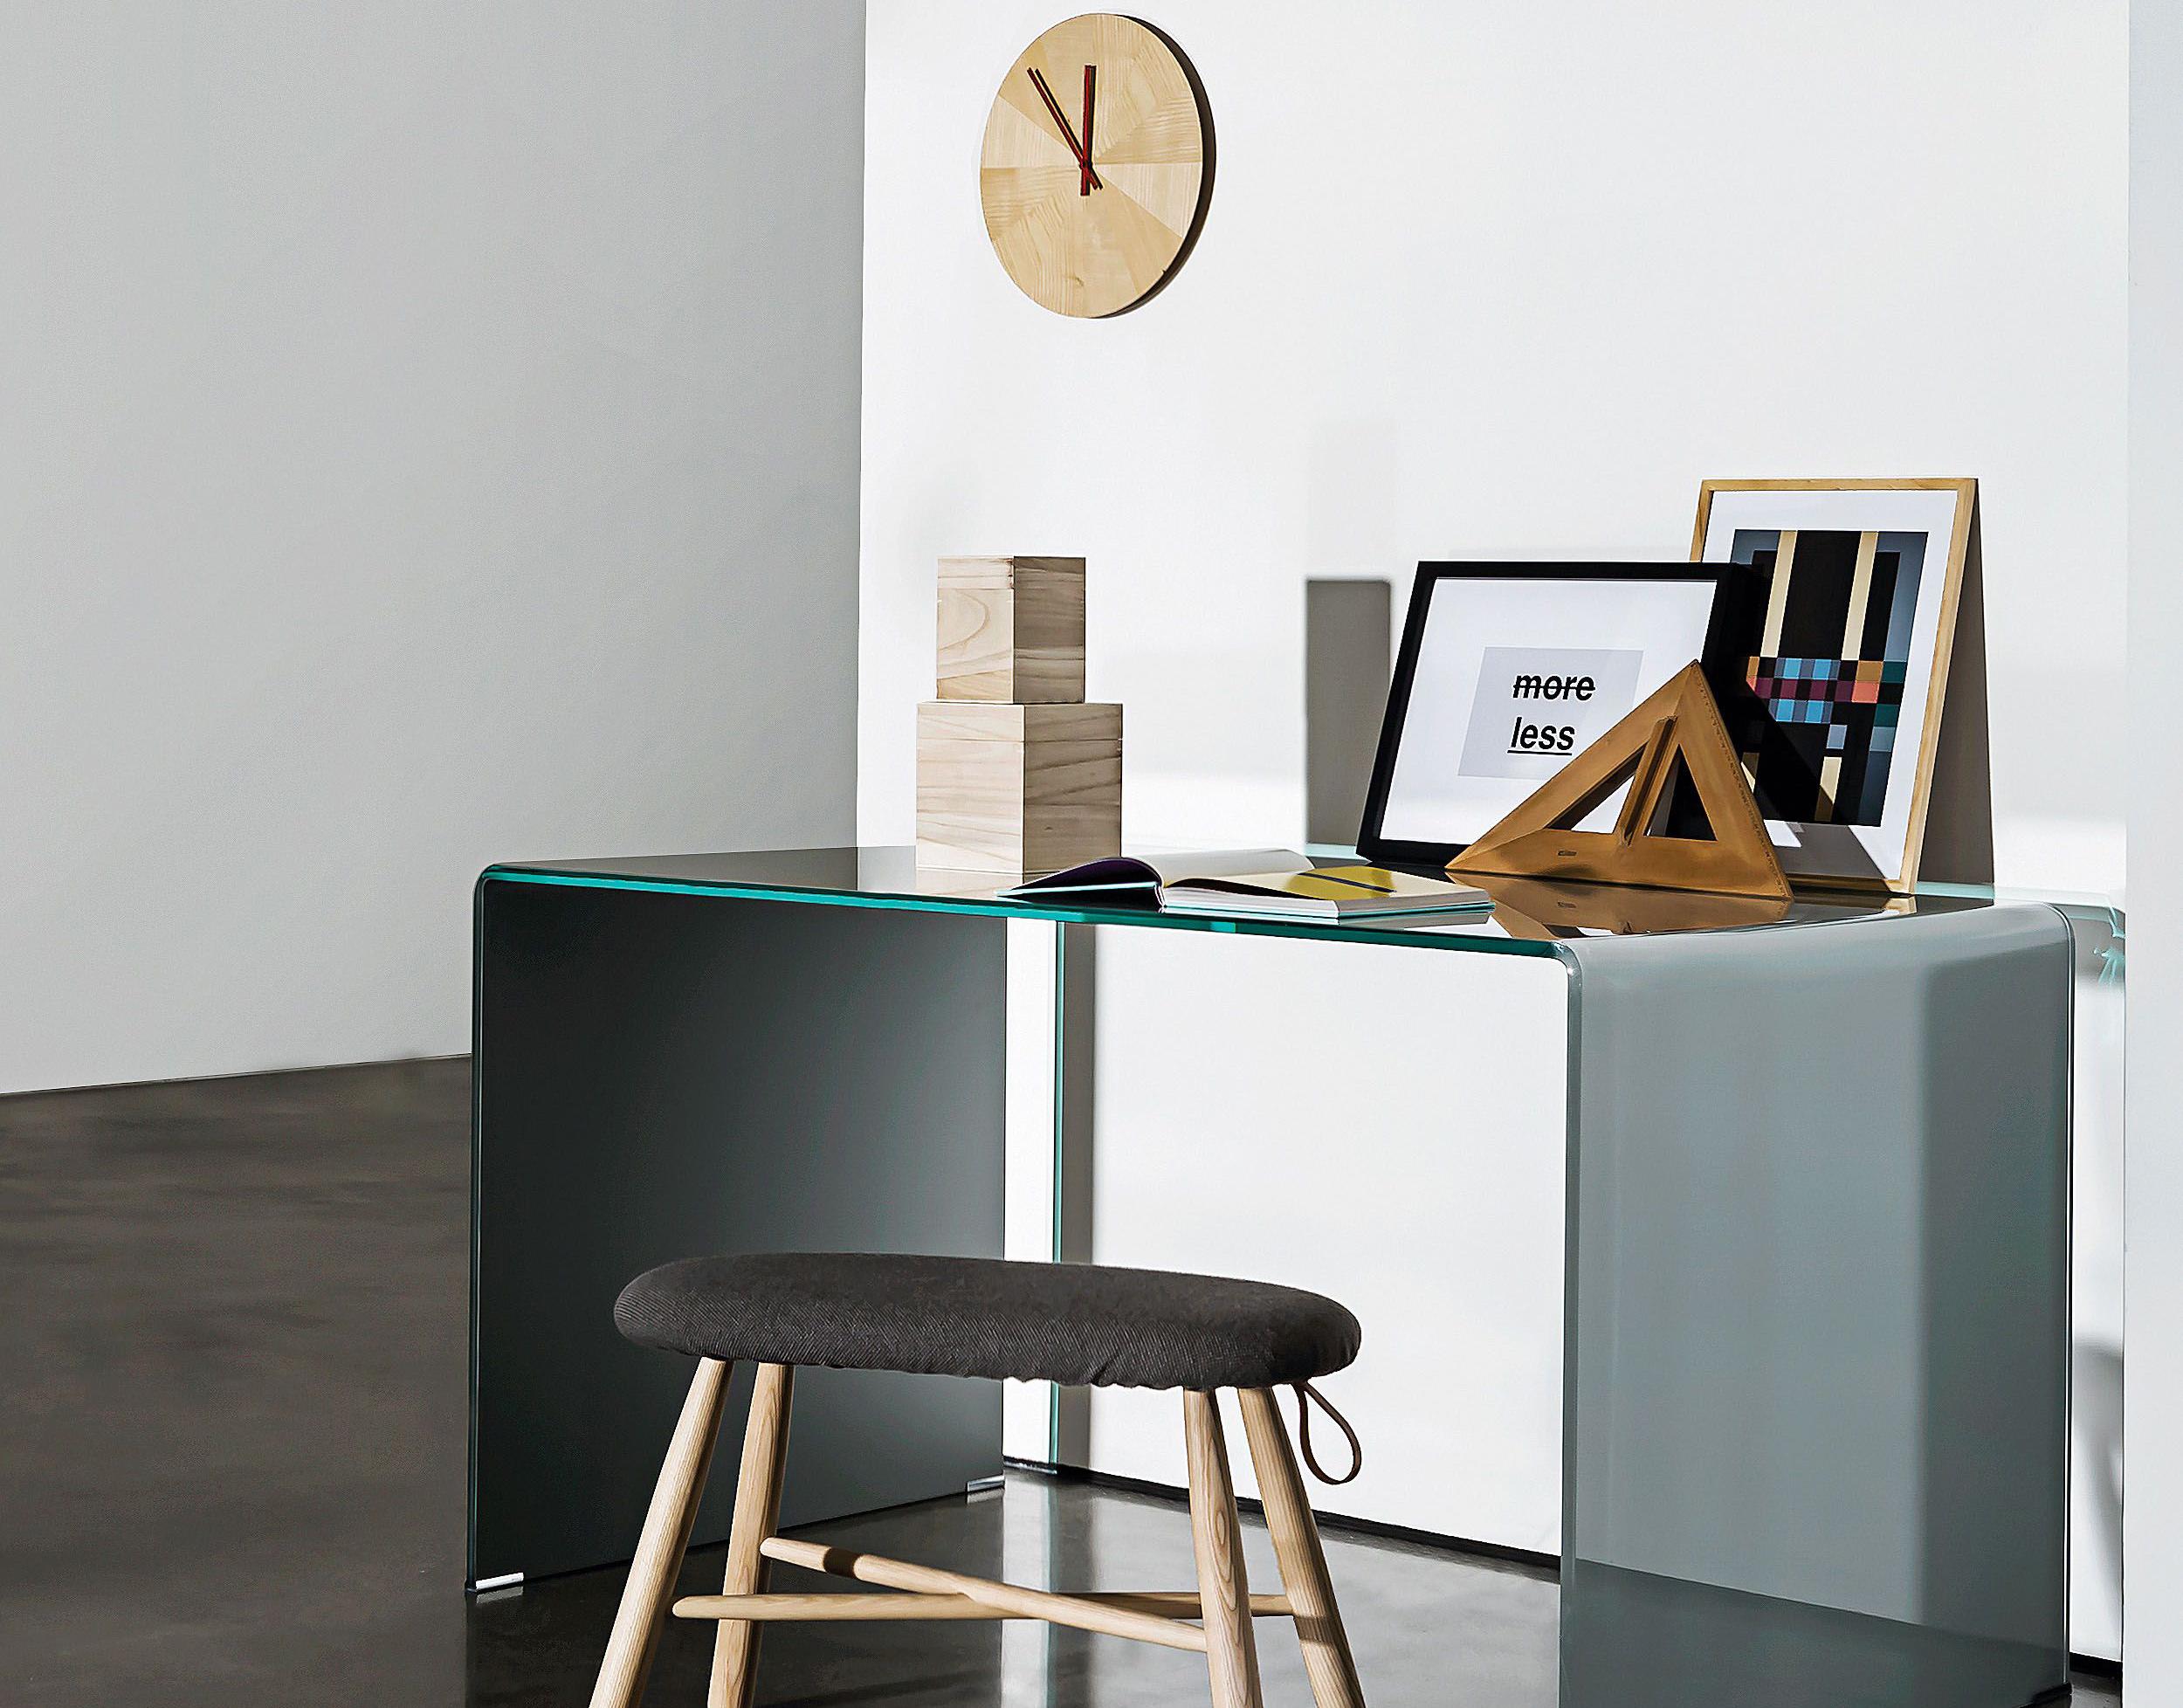 Mesa escritorio de vidrio transparente de Sovet.